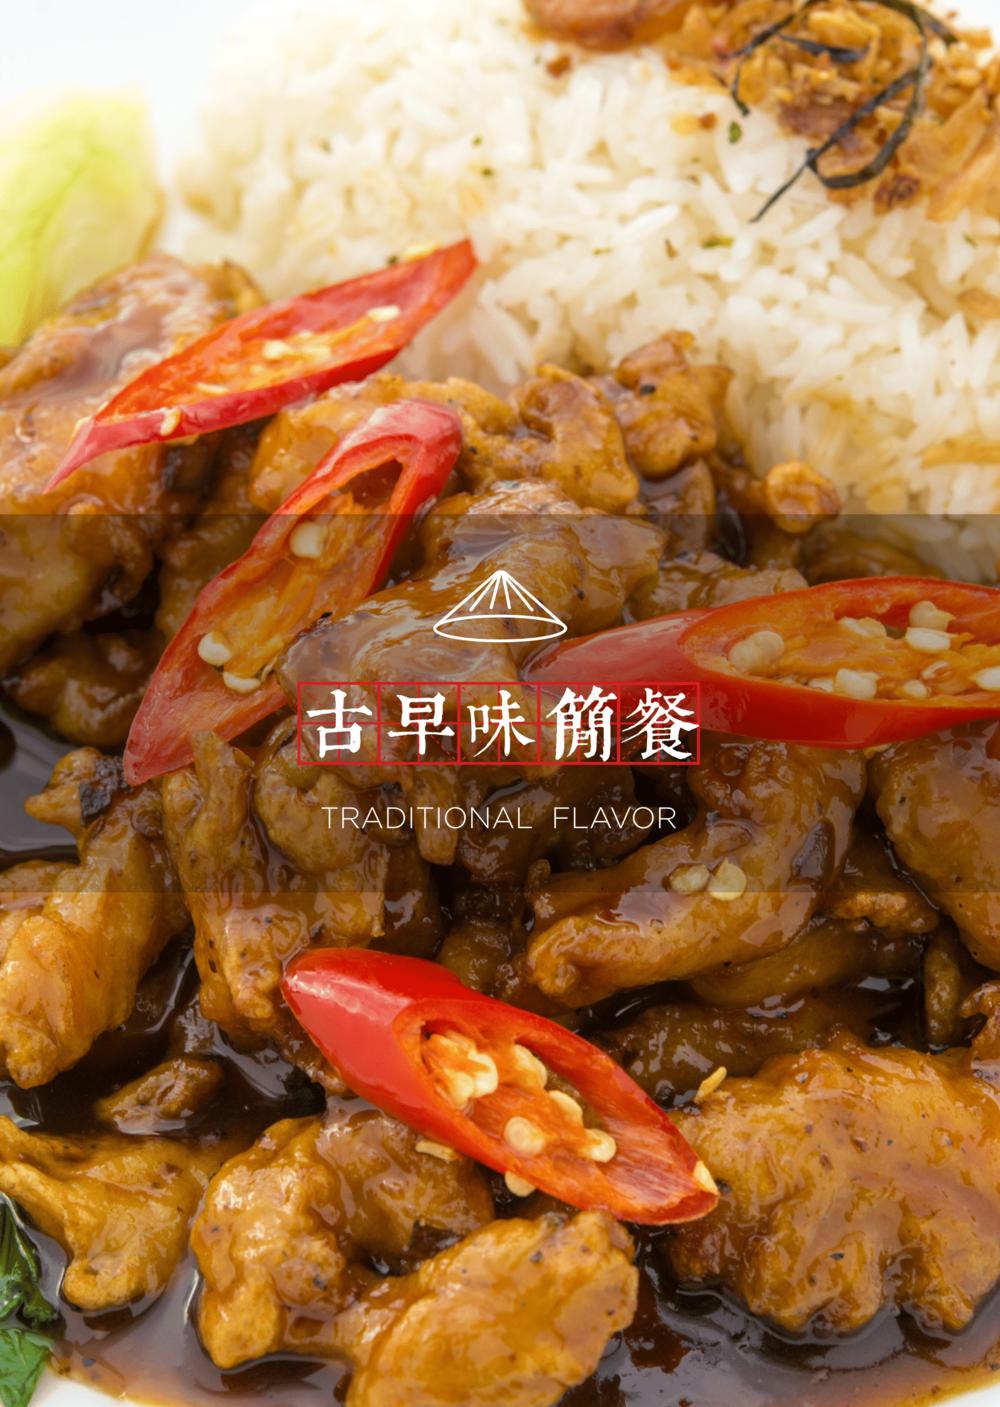 menu2018_小吃饭类-print-22-1.png